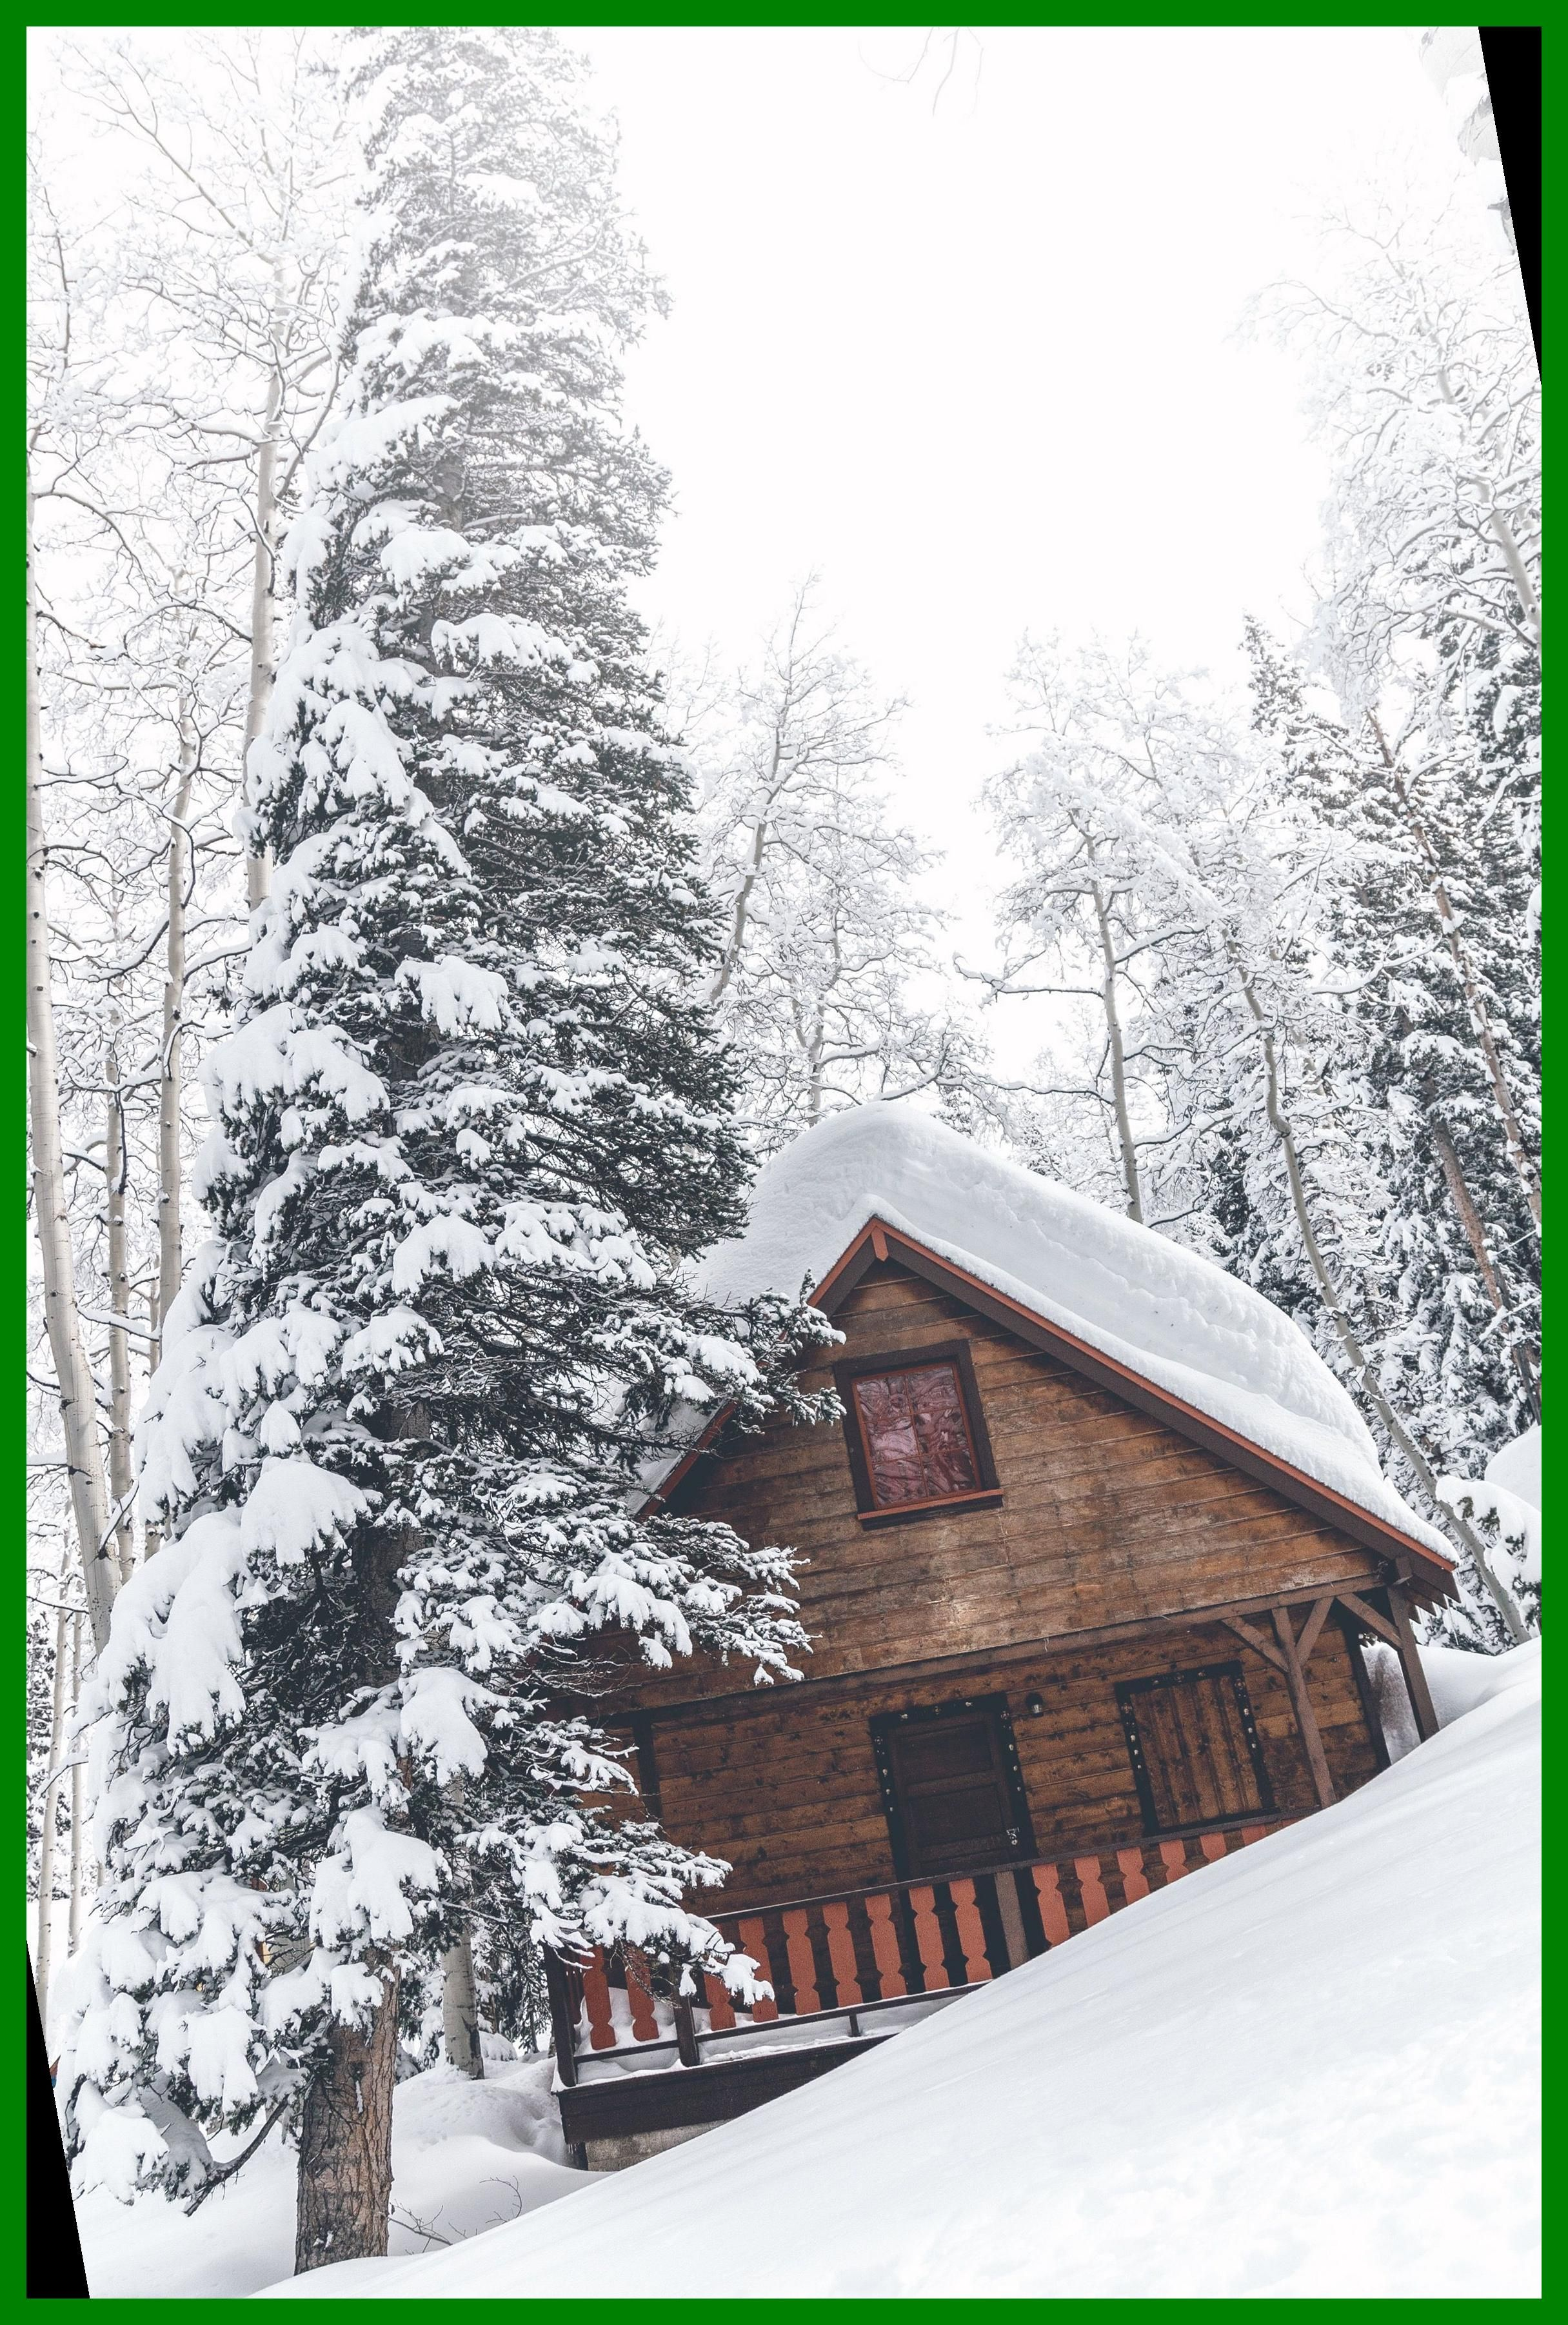 Cabin In The Woods Rustic Cabin Wall Art Snowy Winter Scene Snowing Winter Day Log Cabin Print